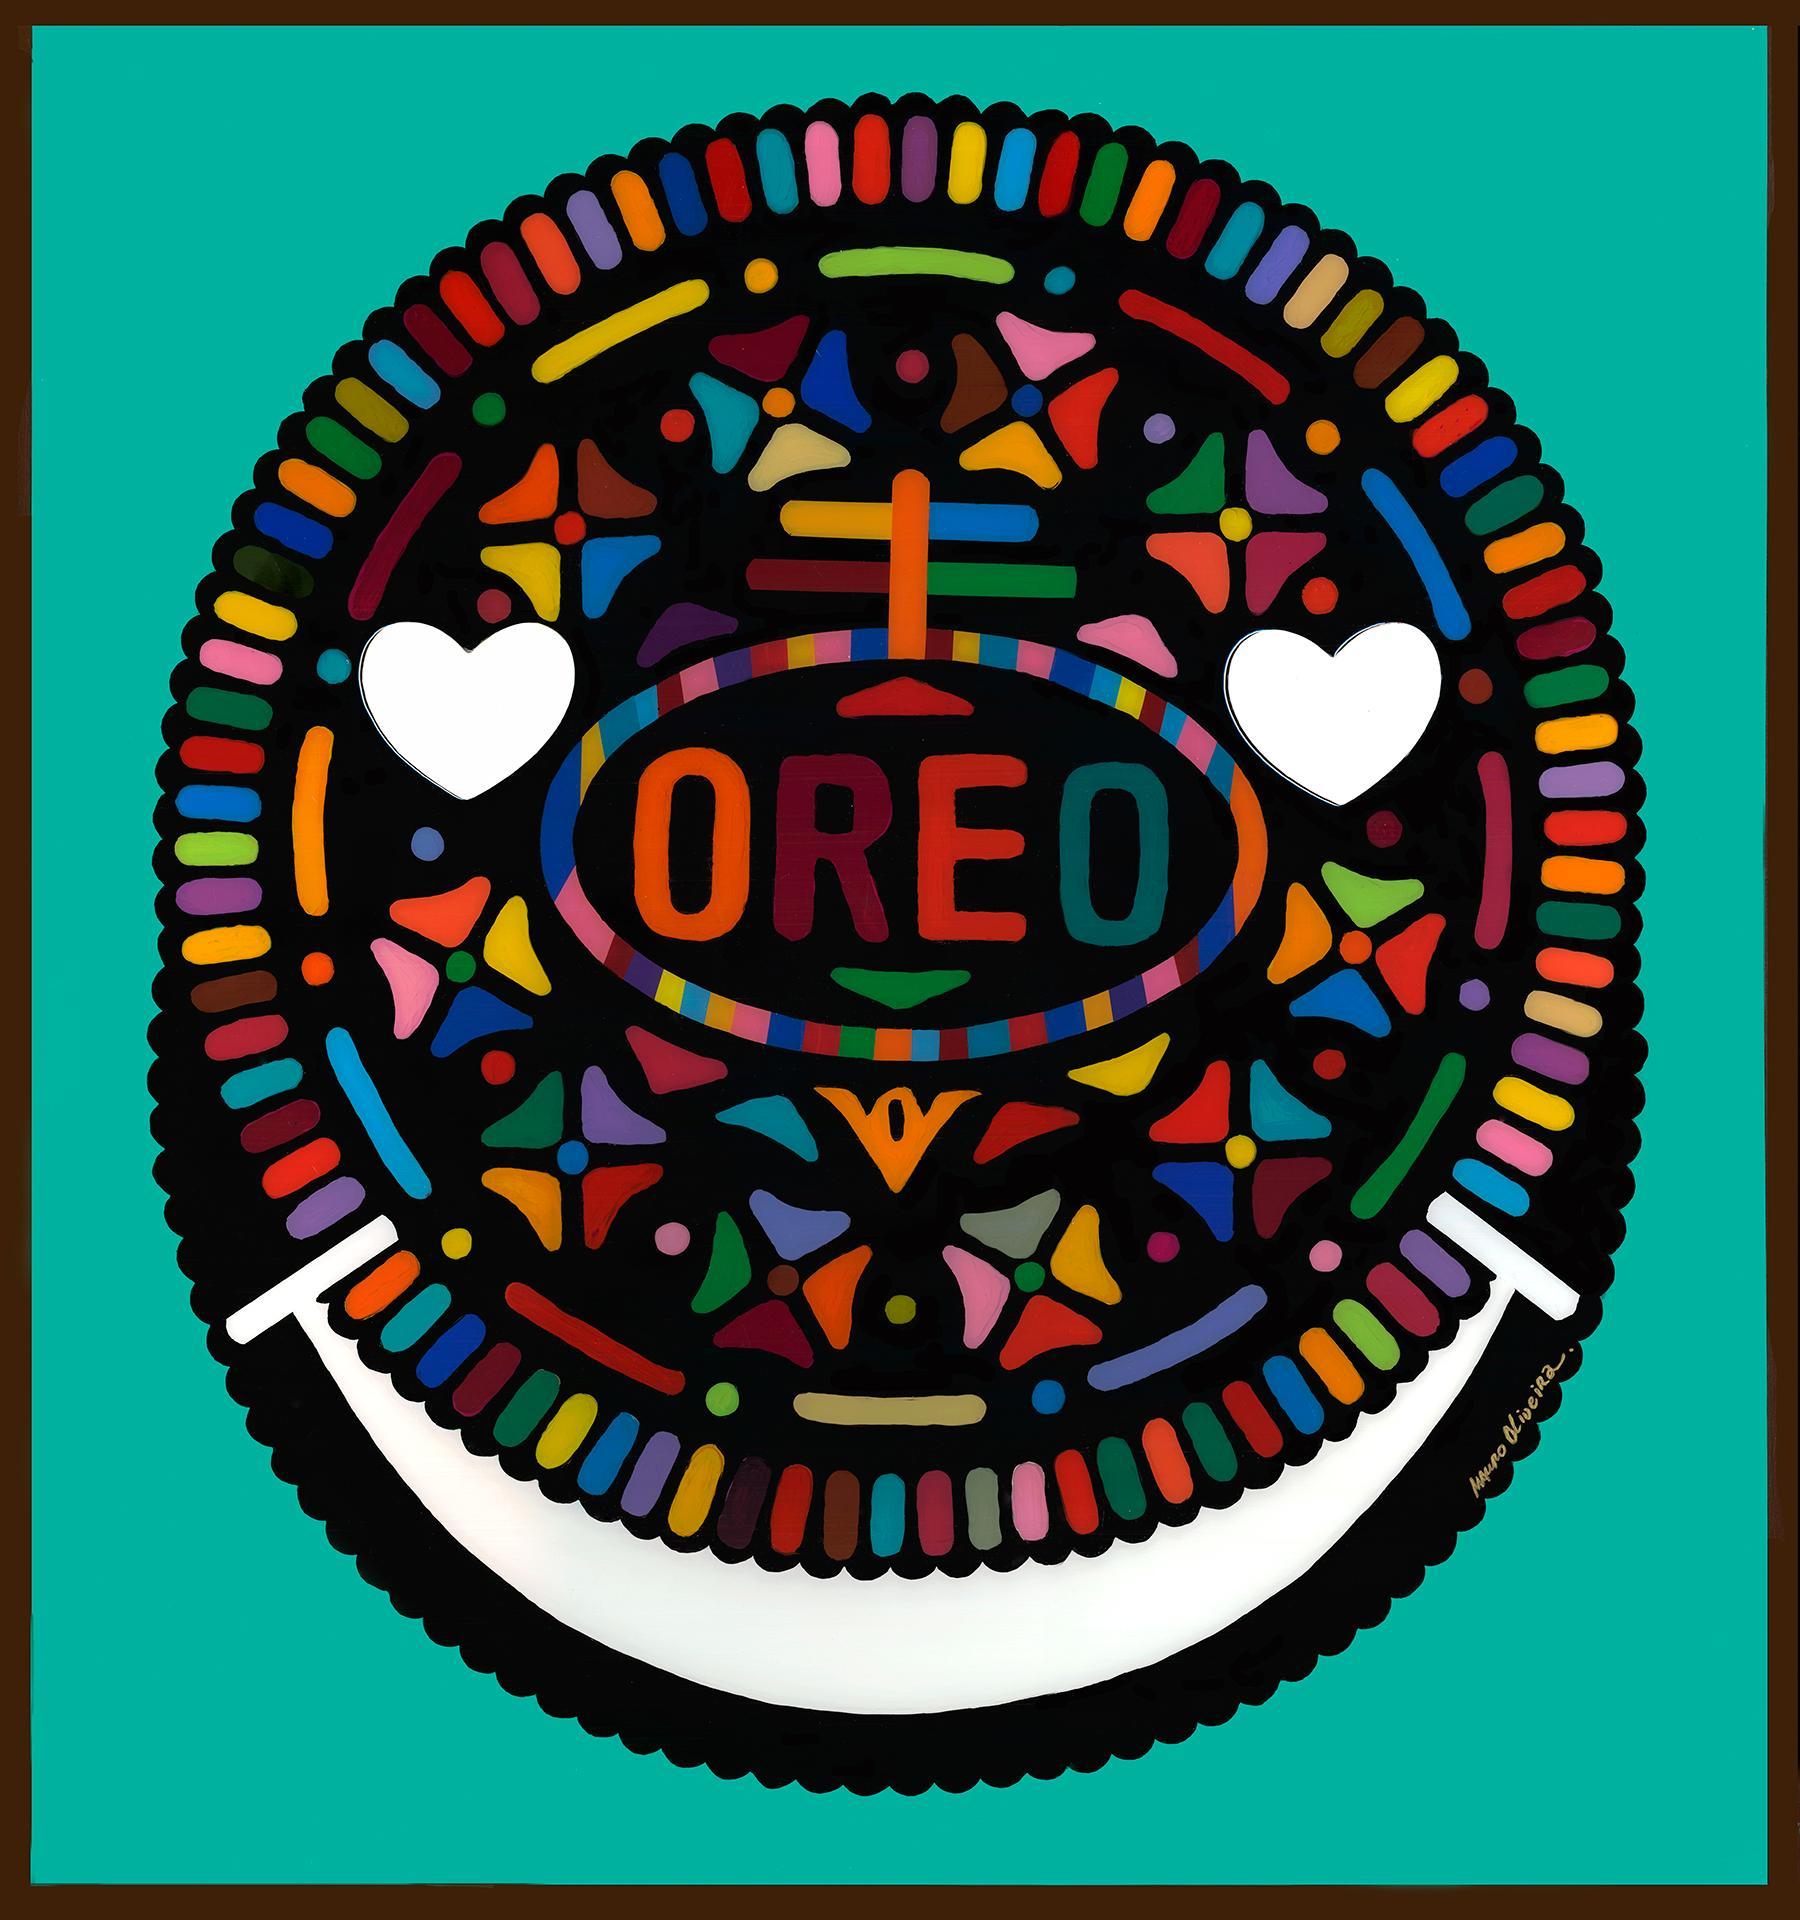 OREO HAPPY HOUR II (Original Framed Mixed Media Artwork).